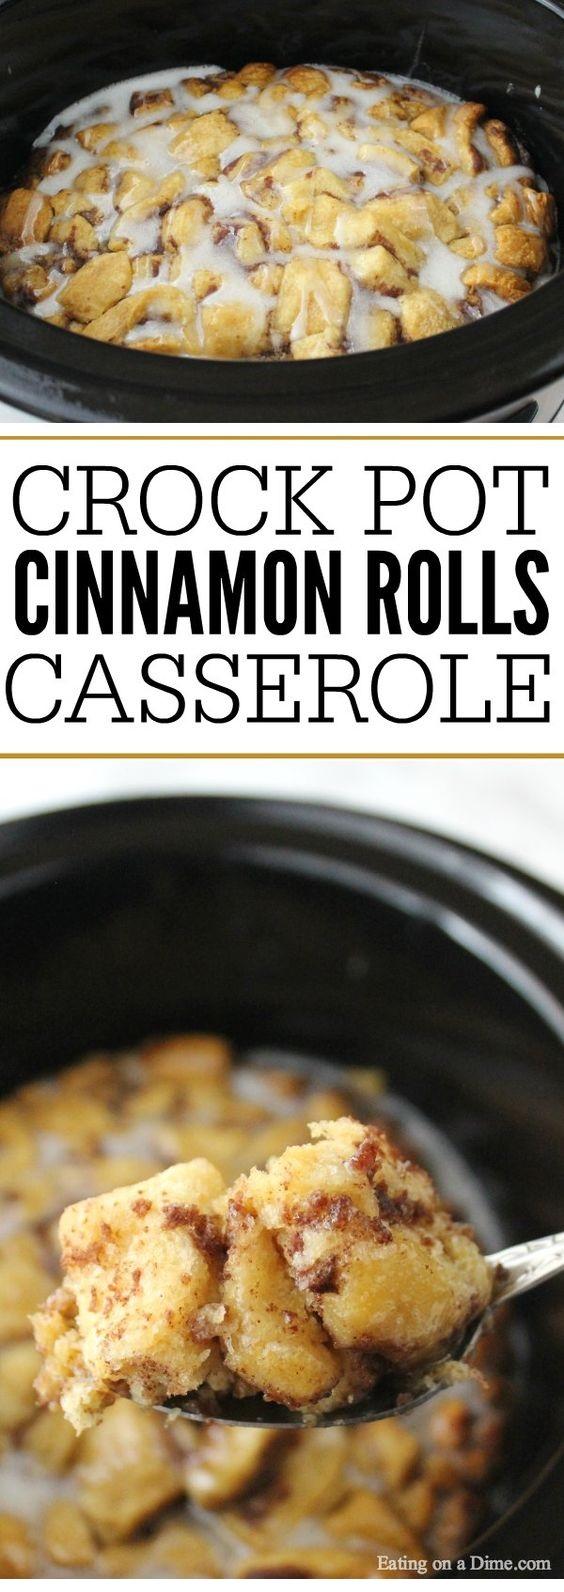 Crock Pot Cinnamon Roll Casserole